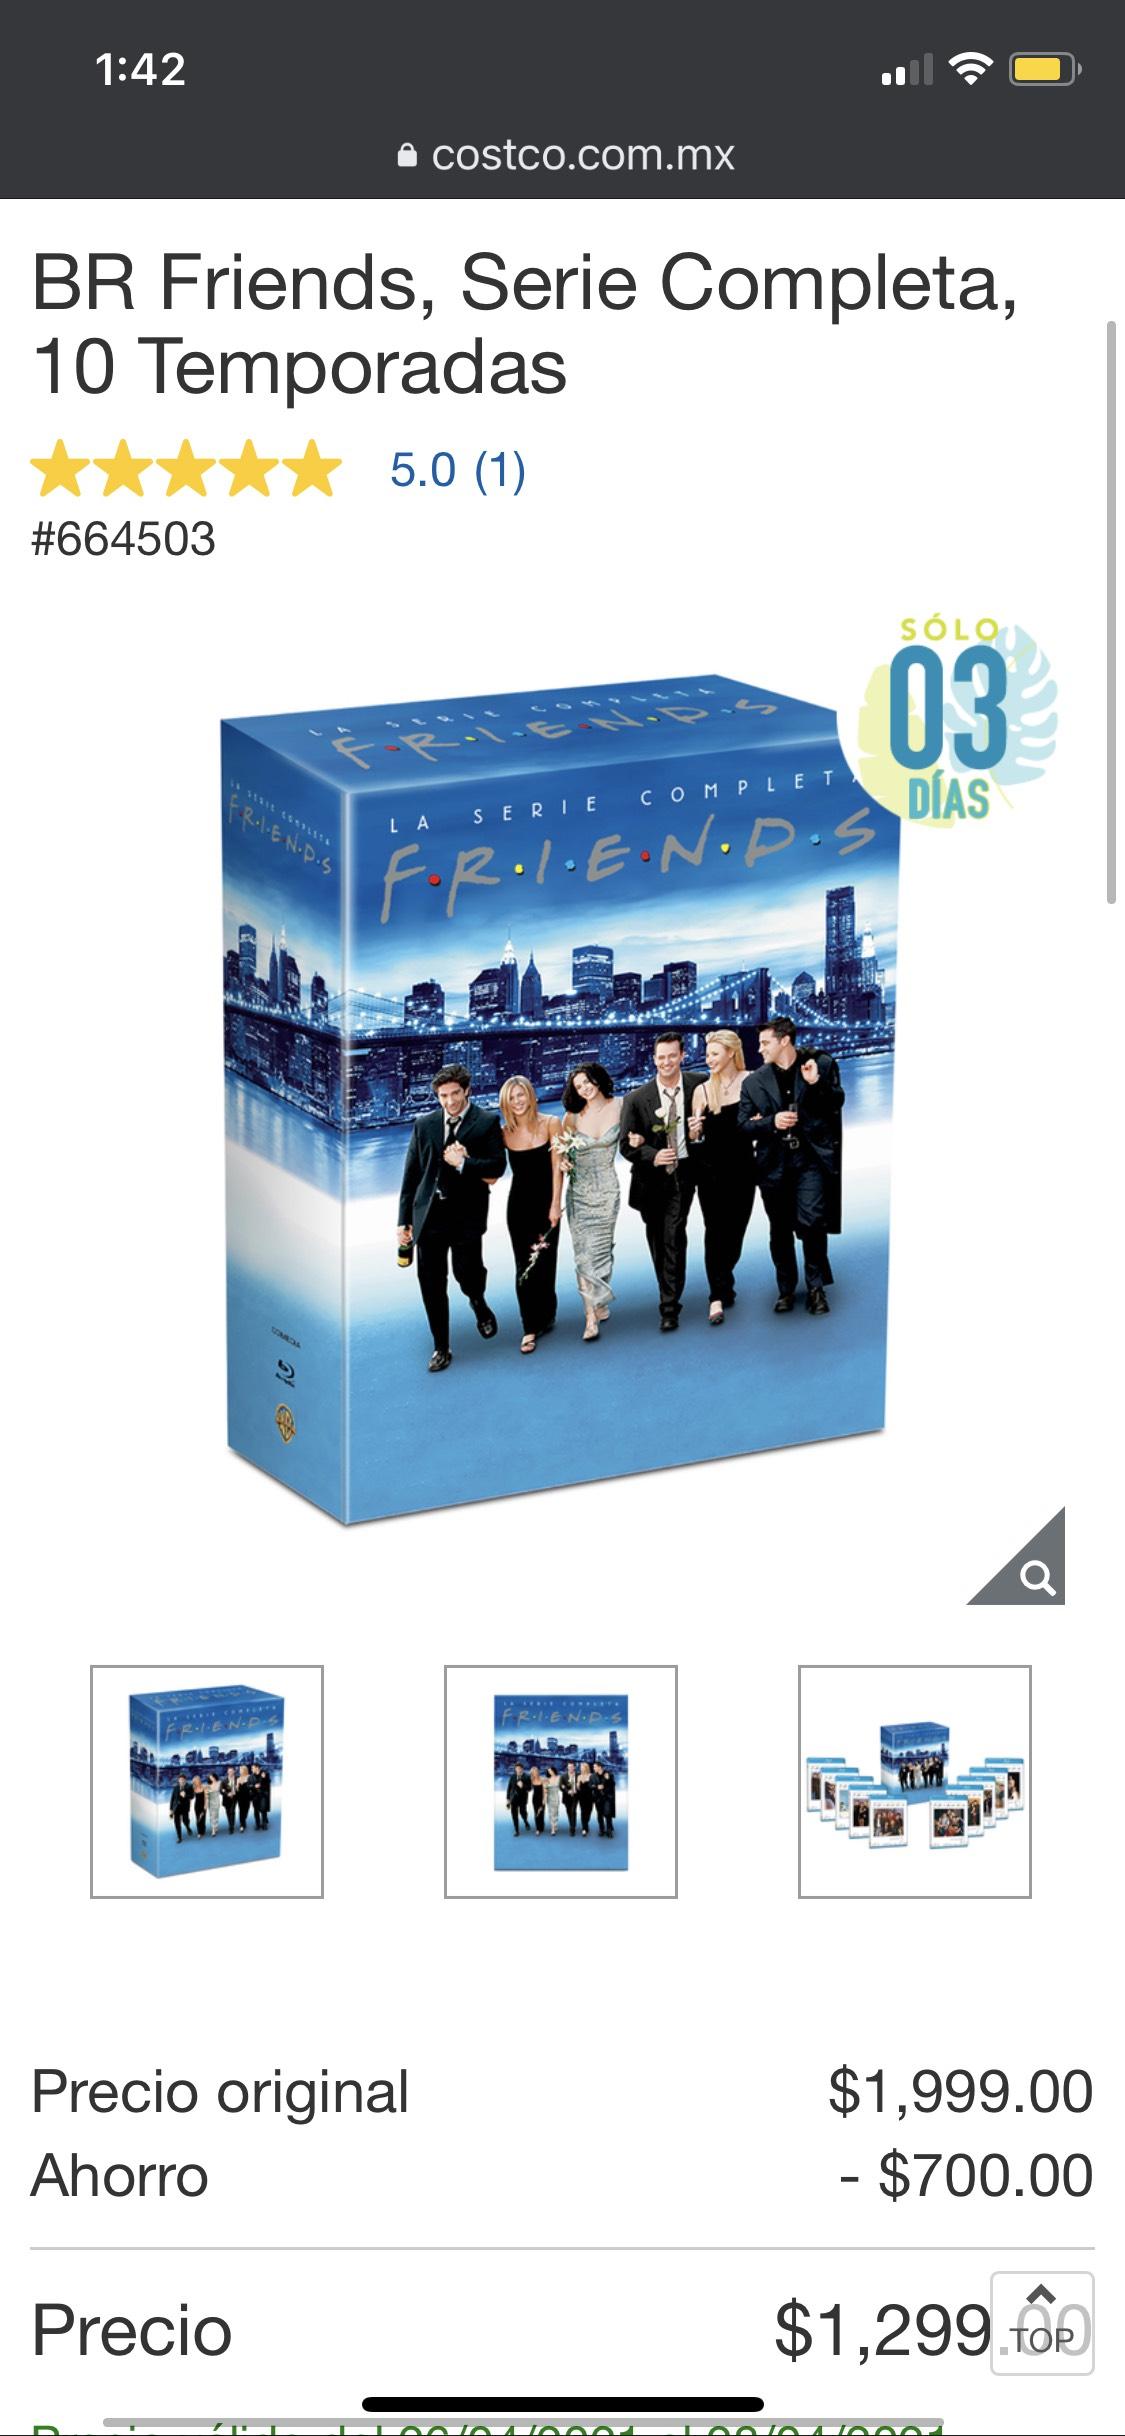 Costco: BR Friends, Serie Completa, 10 Temporadas